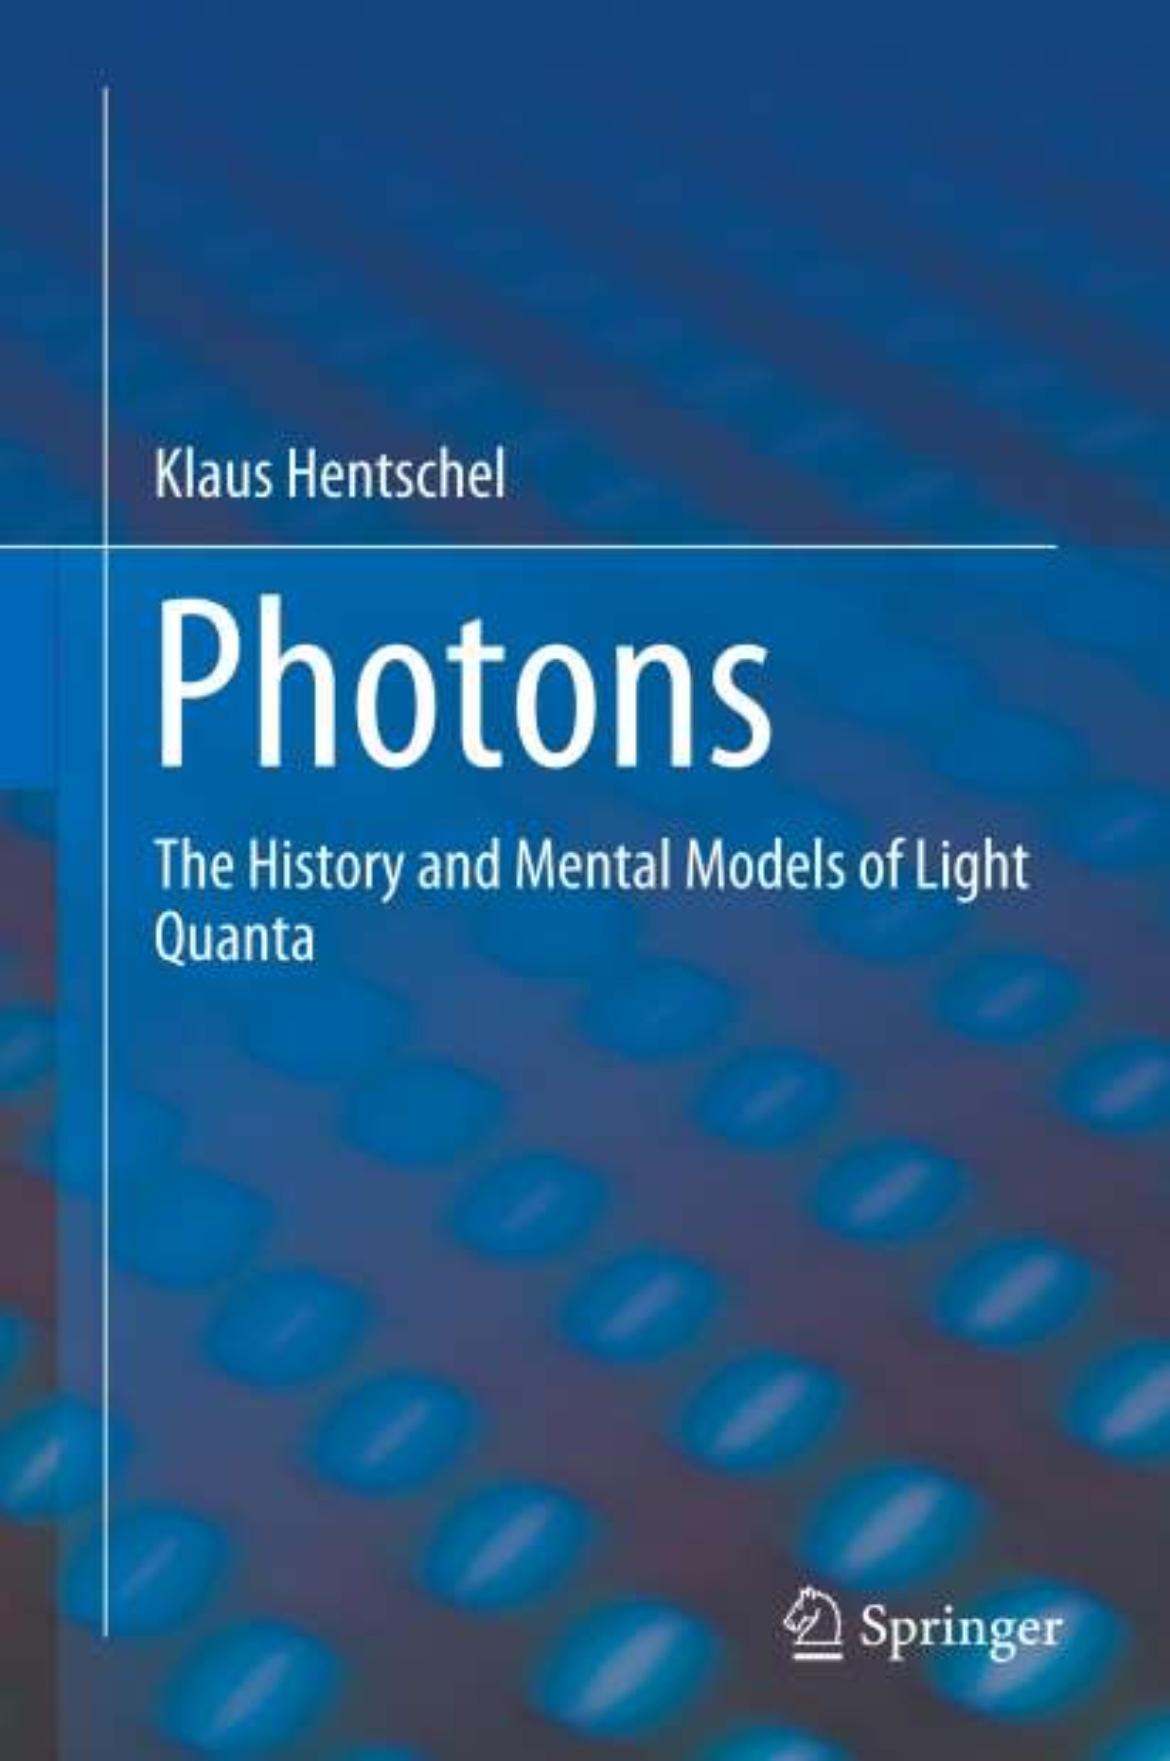 Photons.